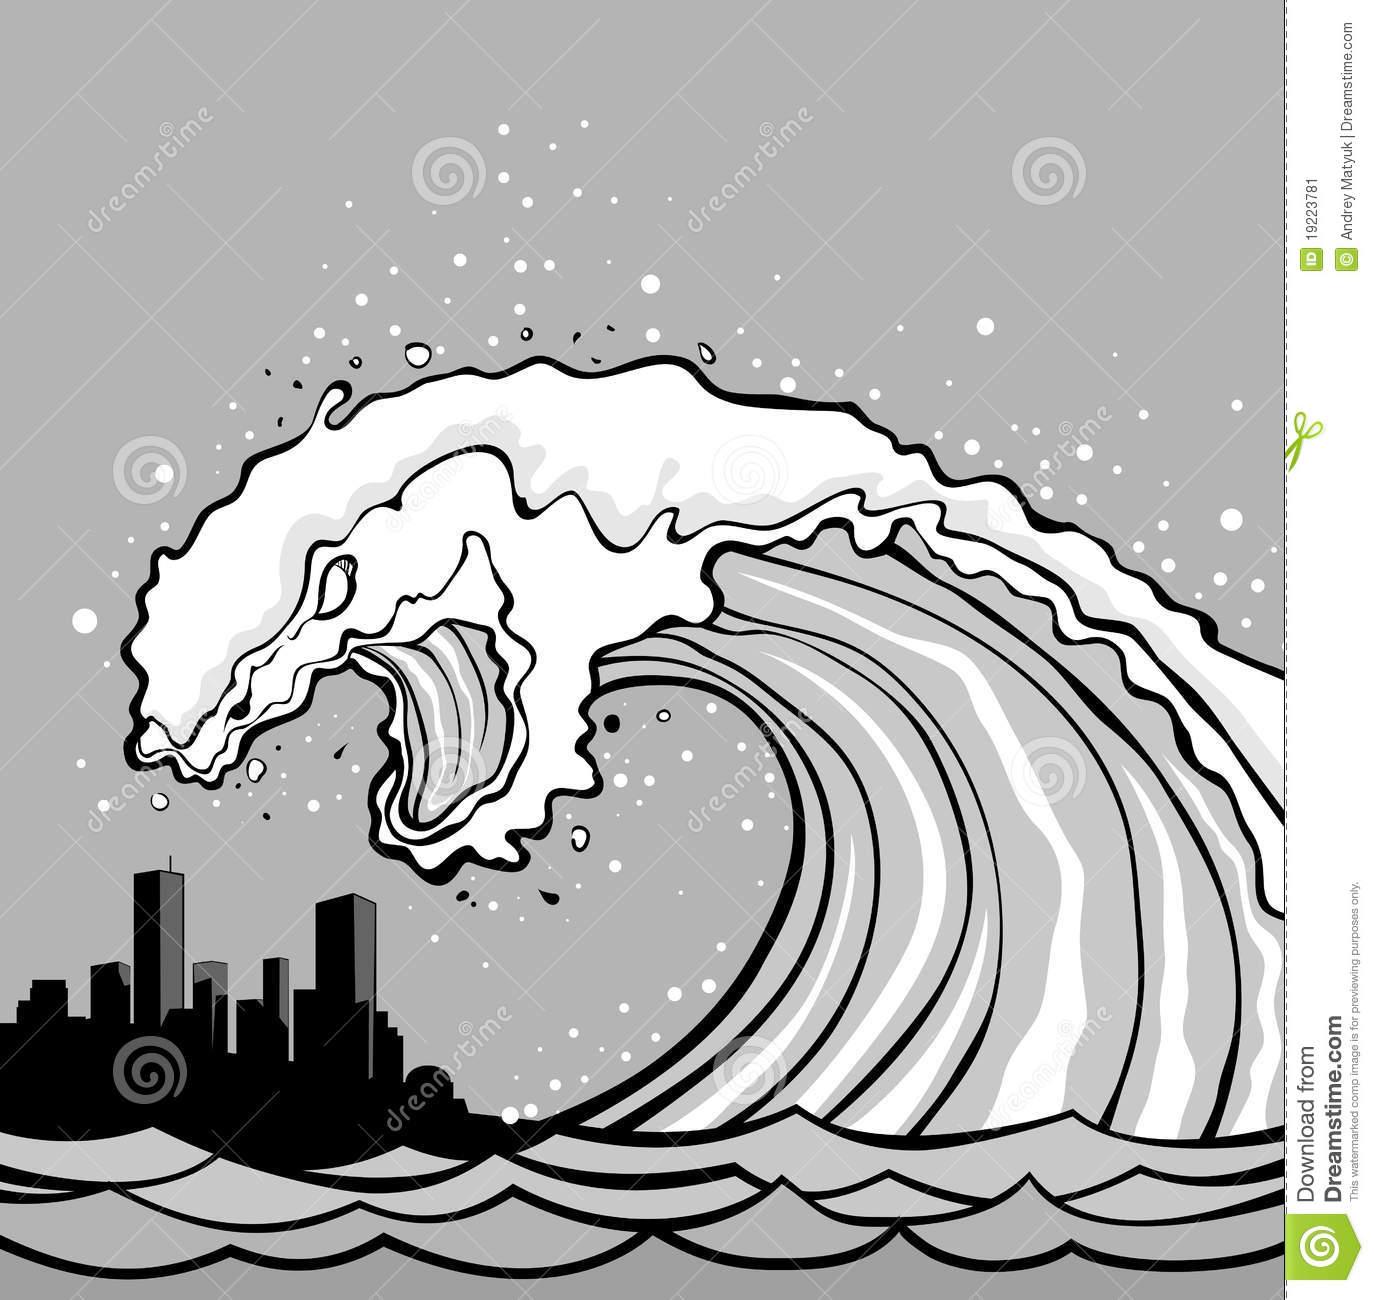 Tsunami clipart Art Panda Clip Tsunami tsunami%20clipart